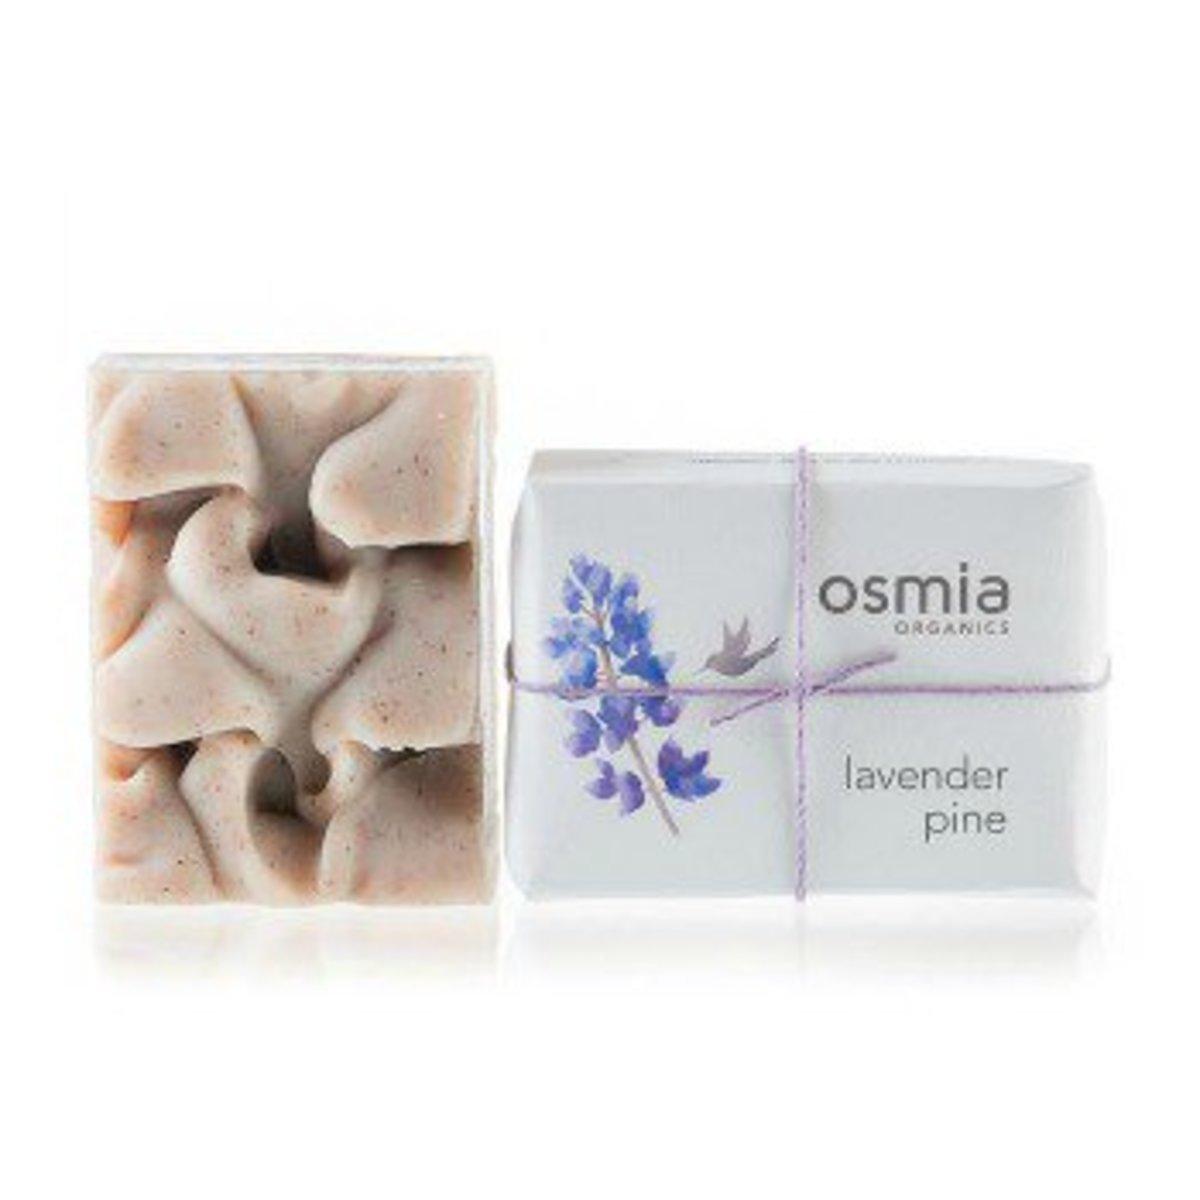 Osmia Organics bar soaps